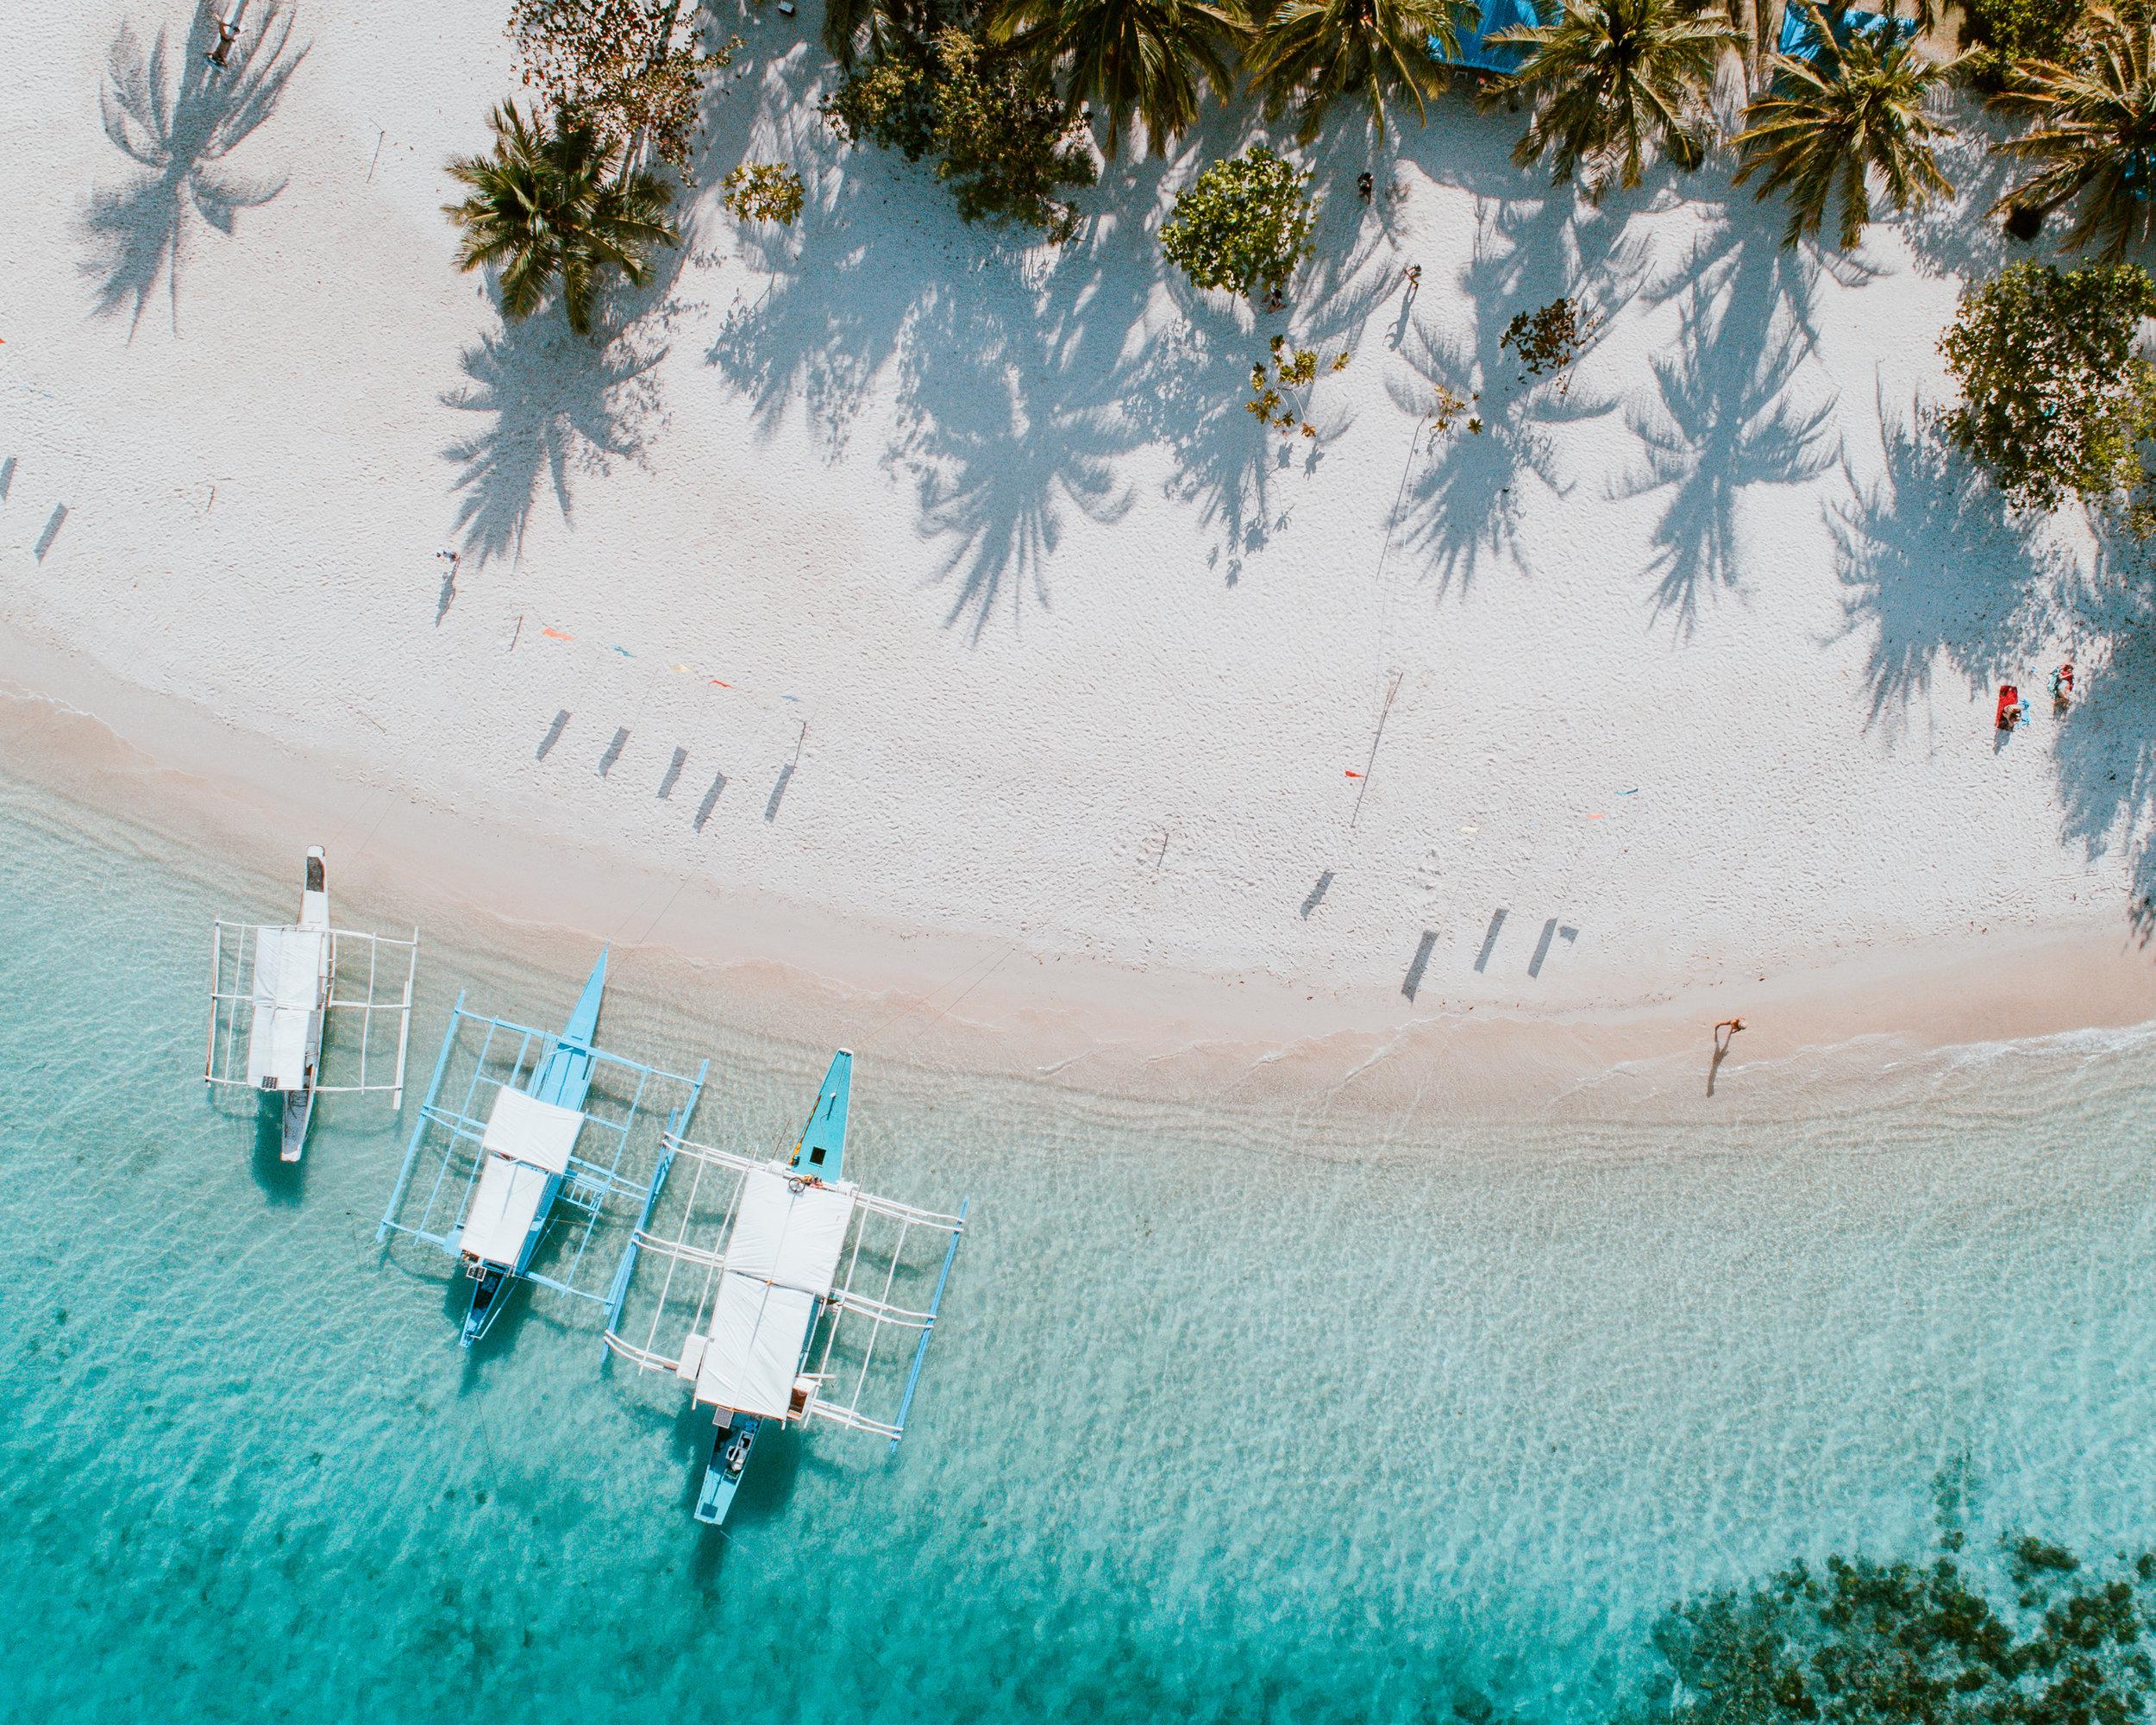 Pass Island, Coron, Philippines